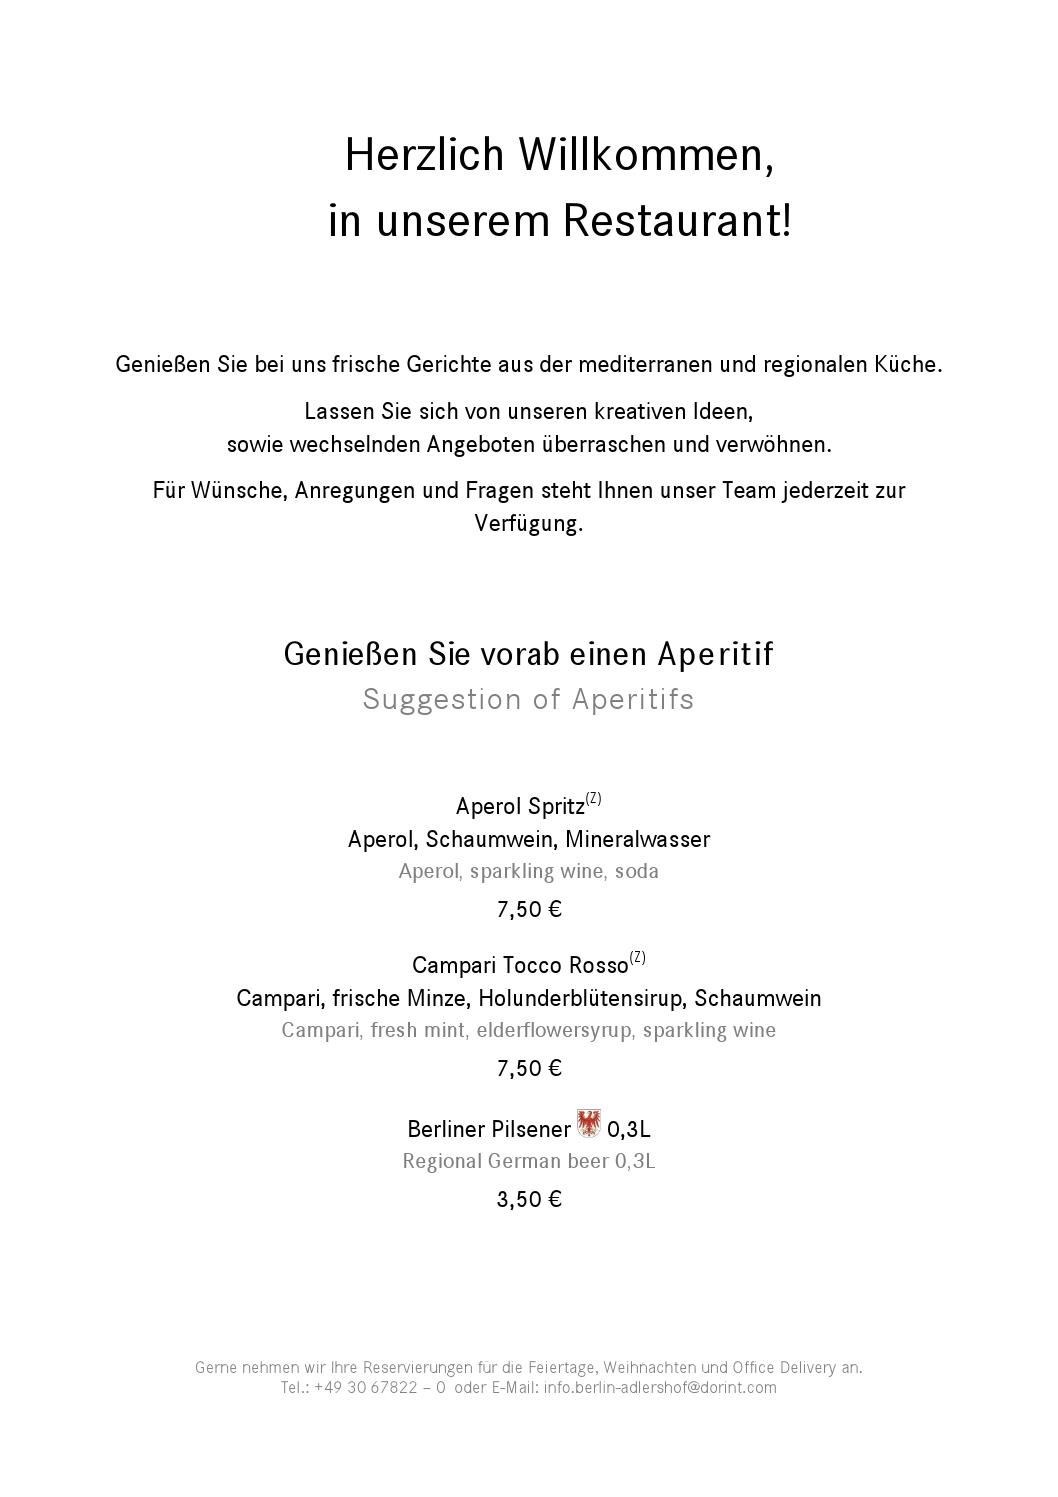 Speisekarte Restaurant Im Dorint Hotel Adlershof Berlin Hotel Hotels And Resorts Resort